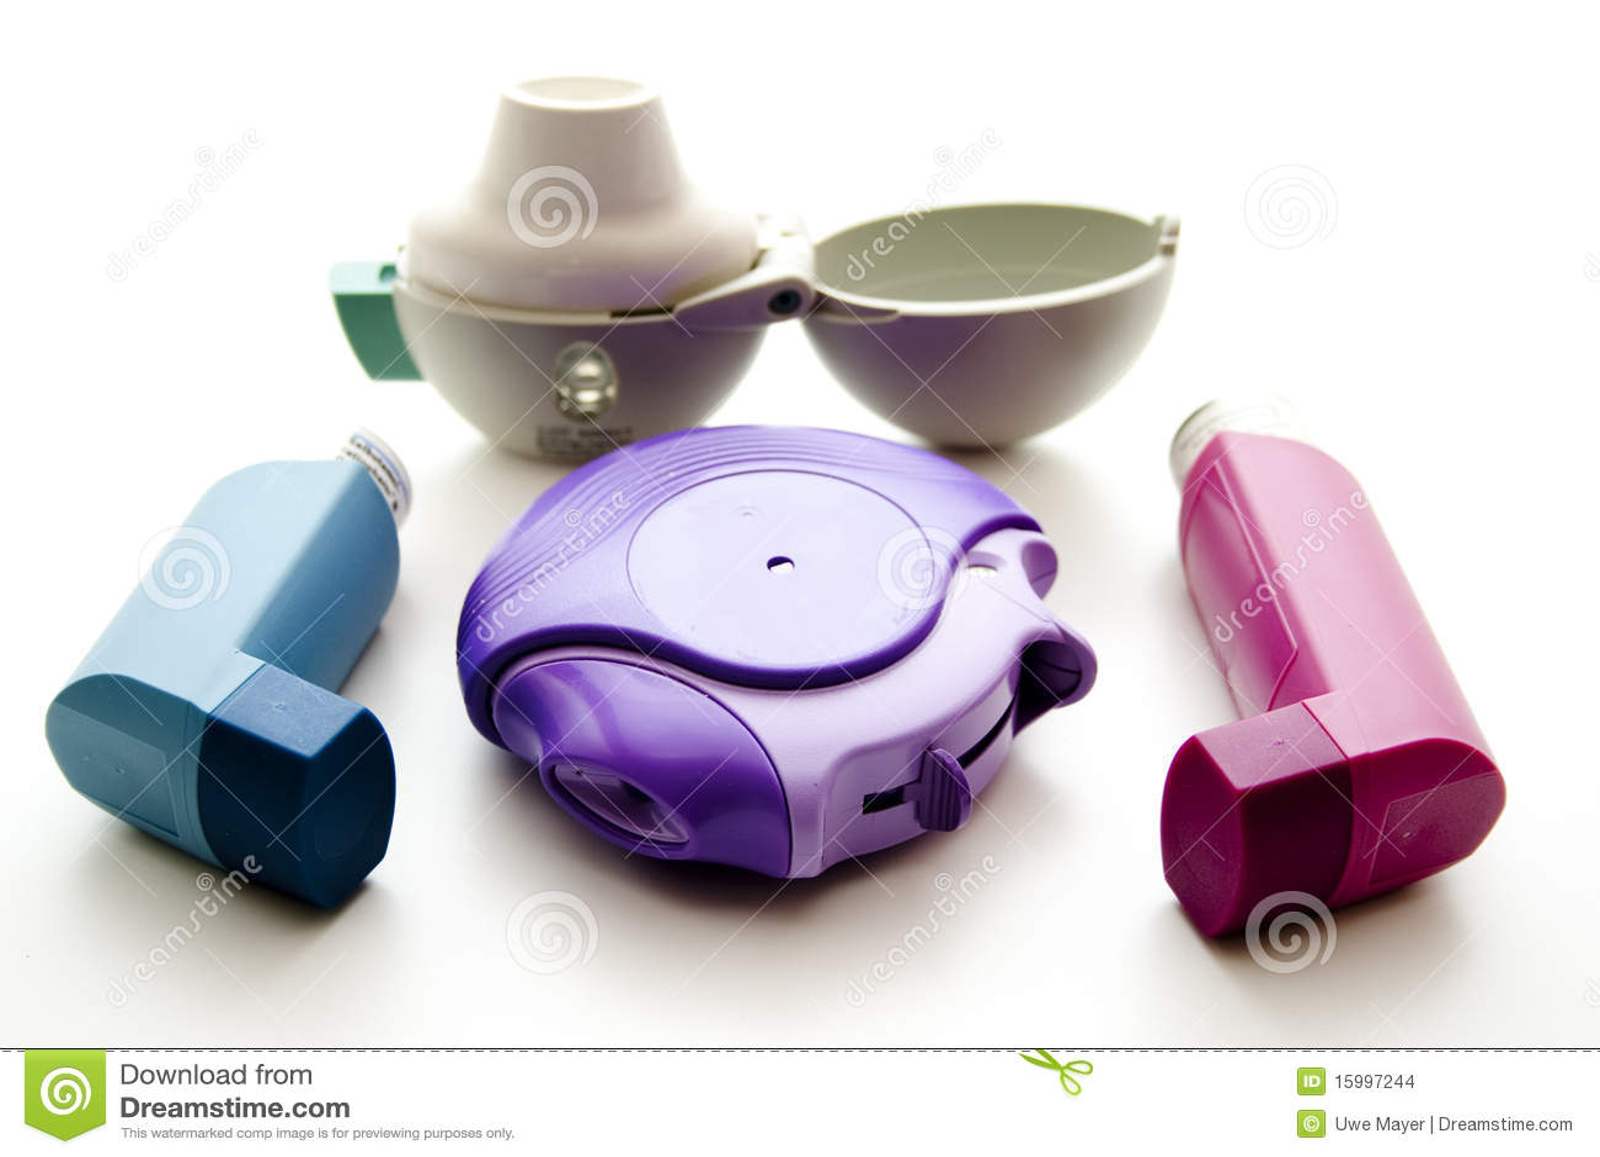 HOME - inhalers2233.si...